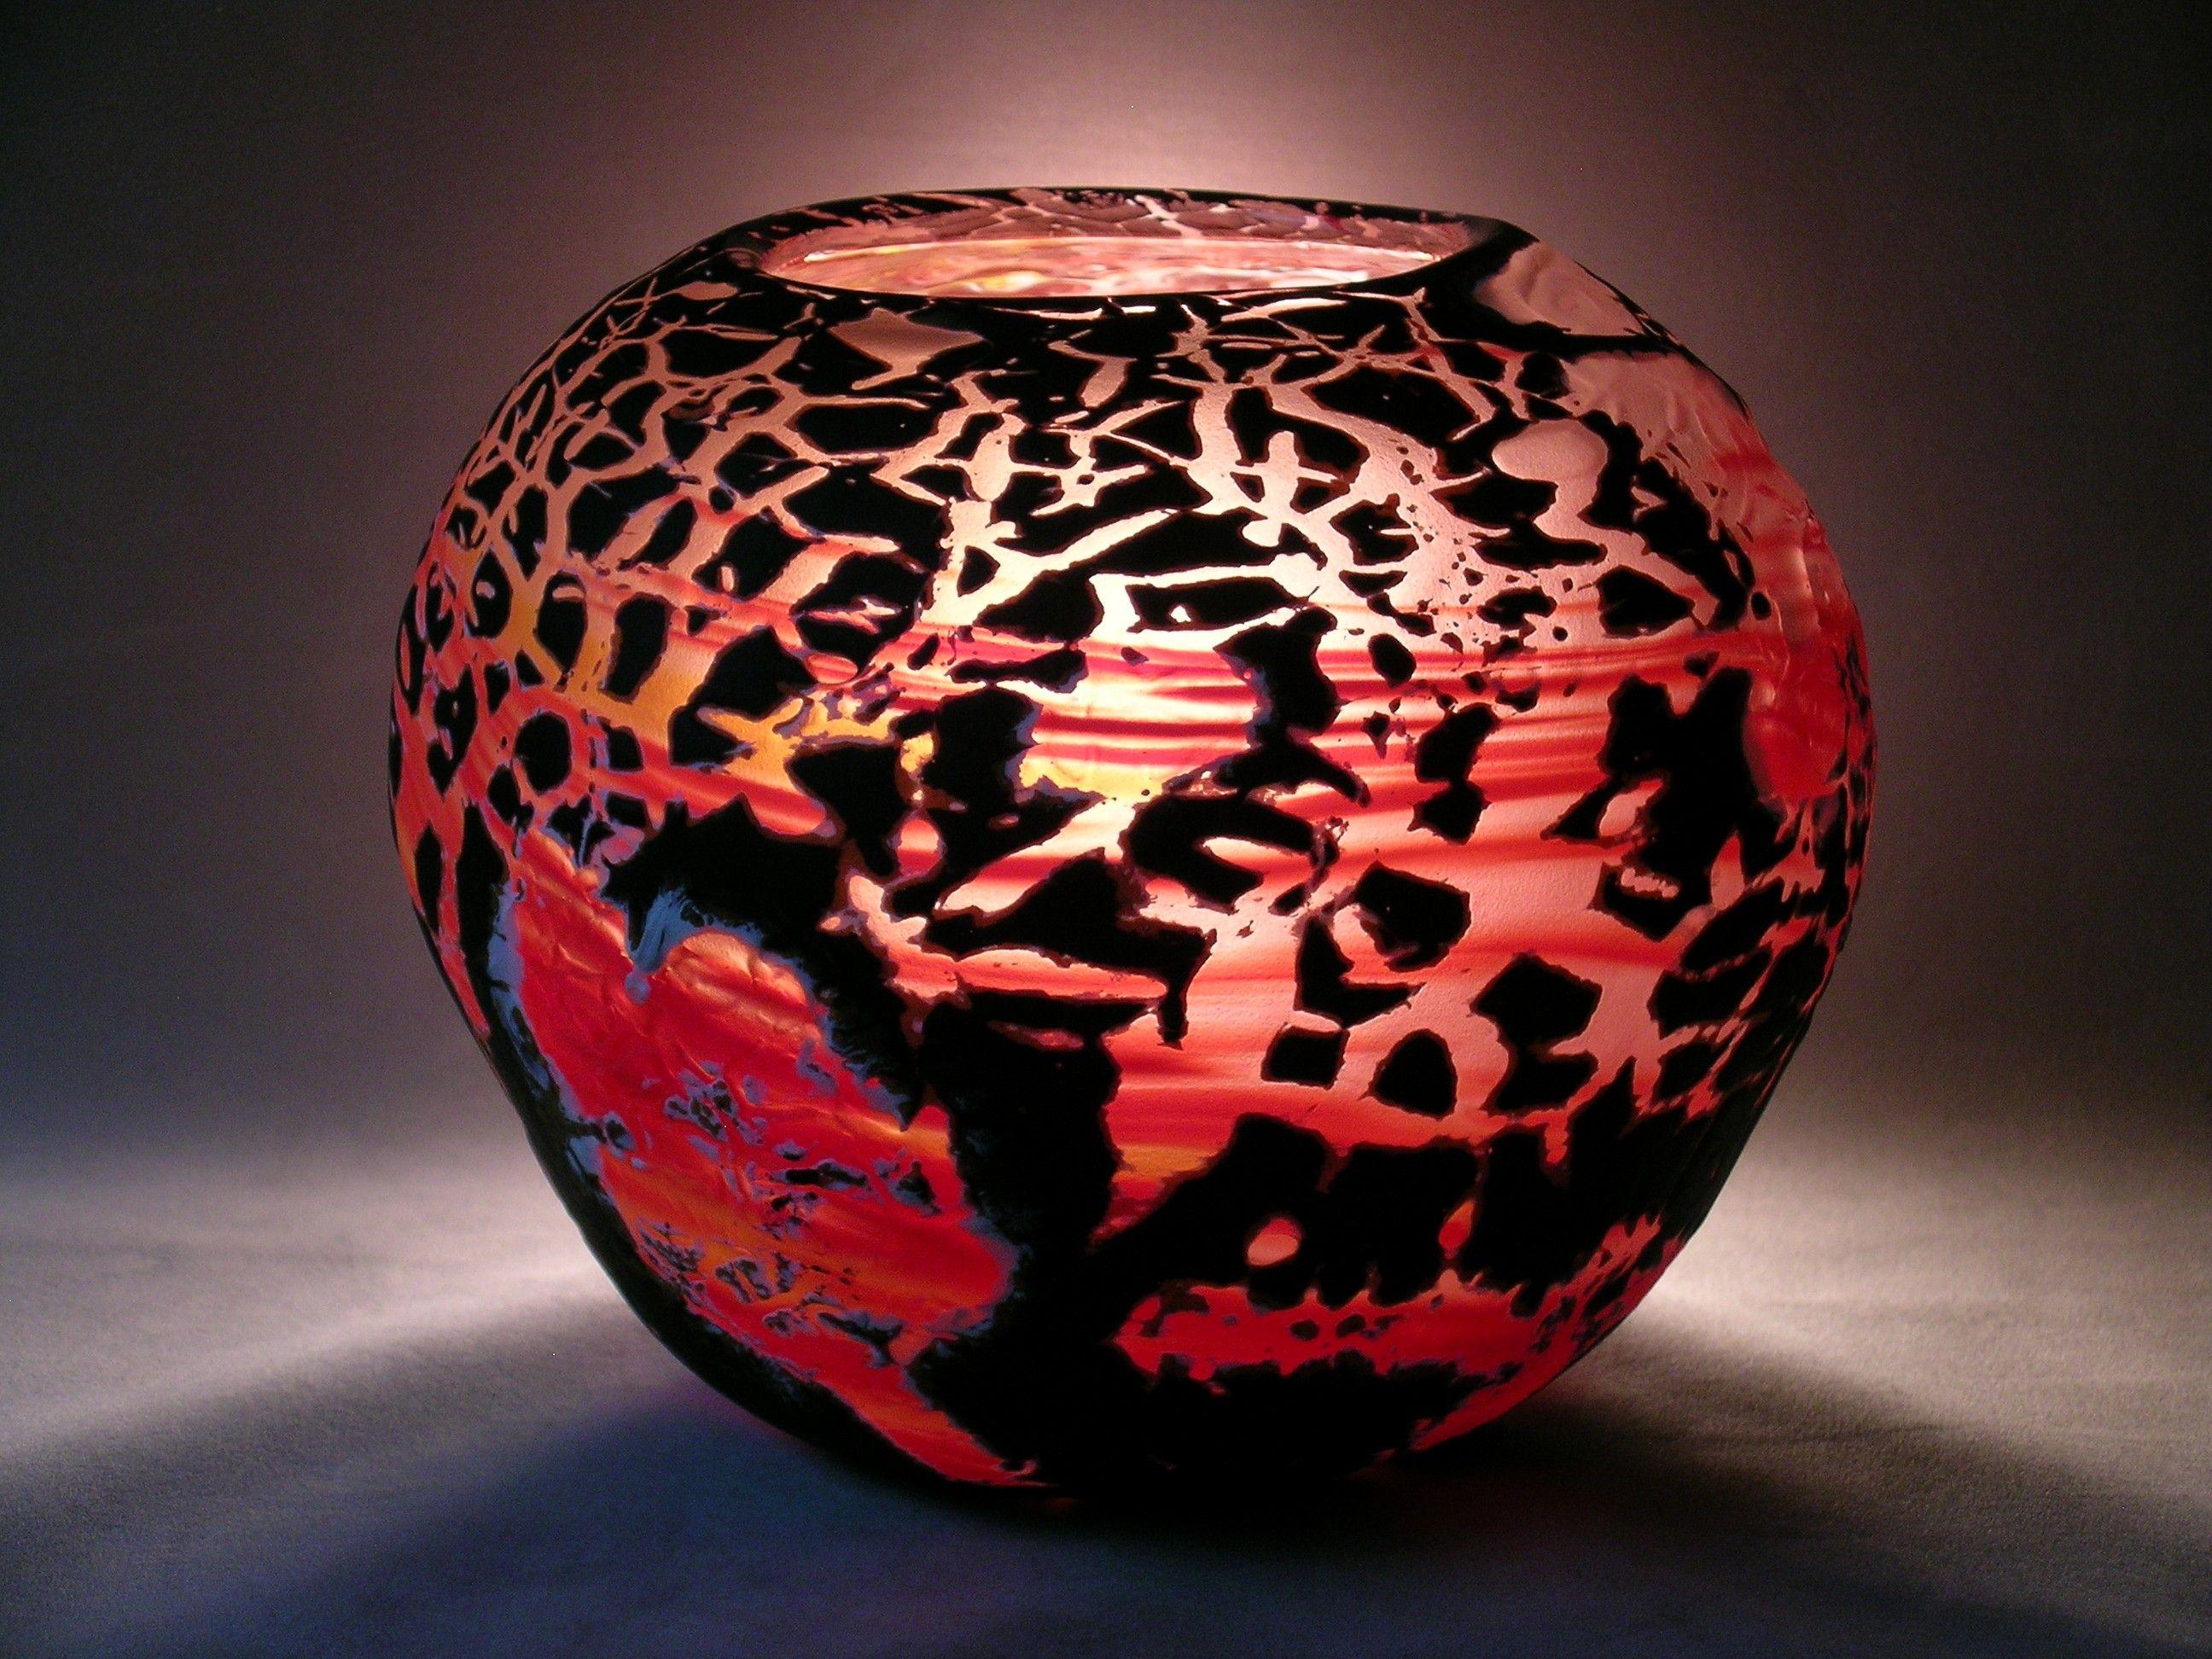 Crackle Bowl Glass art, Kickstarter campaign, Decor